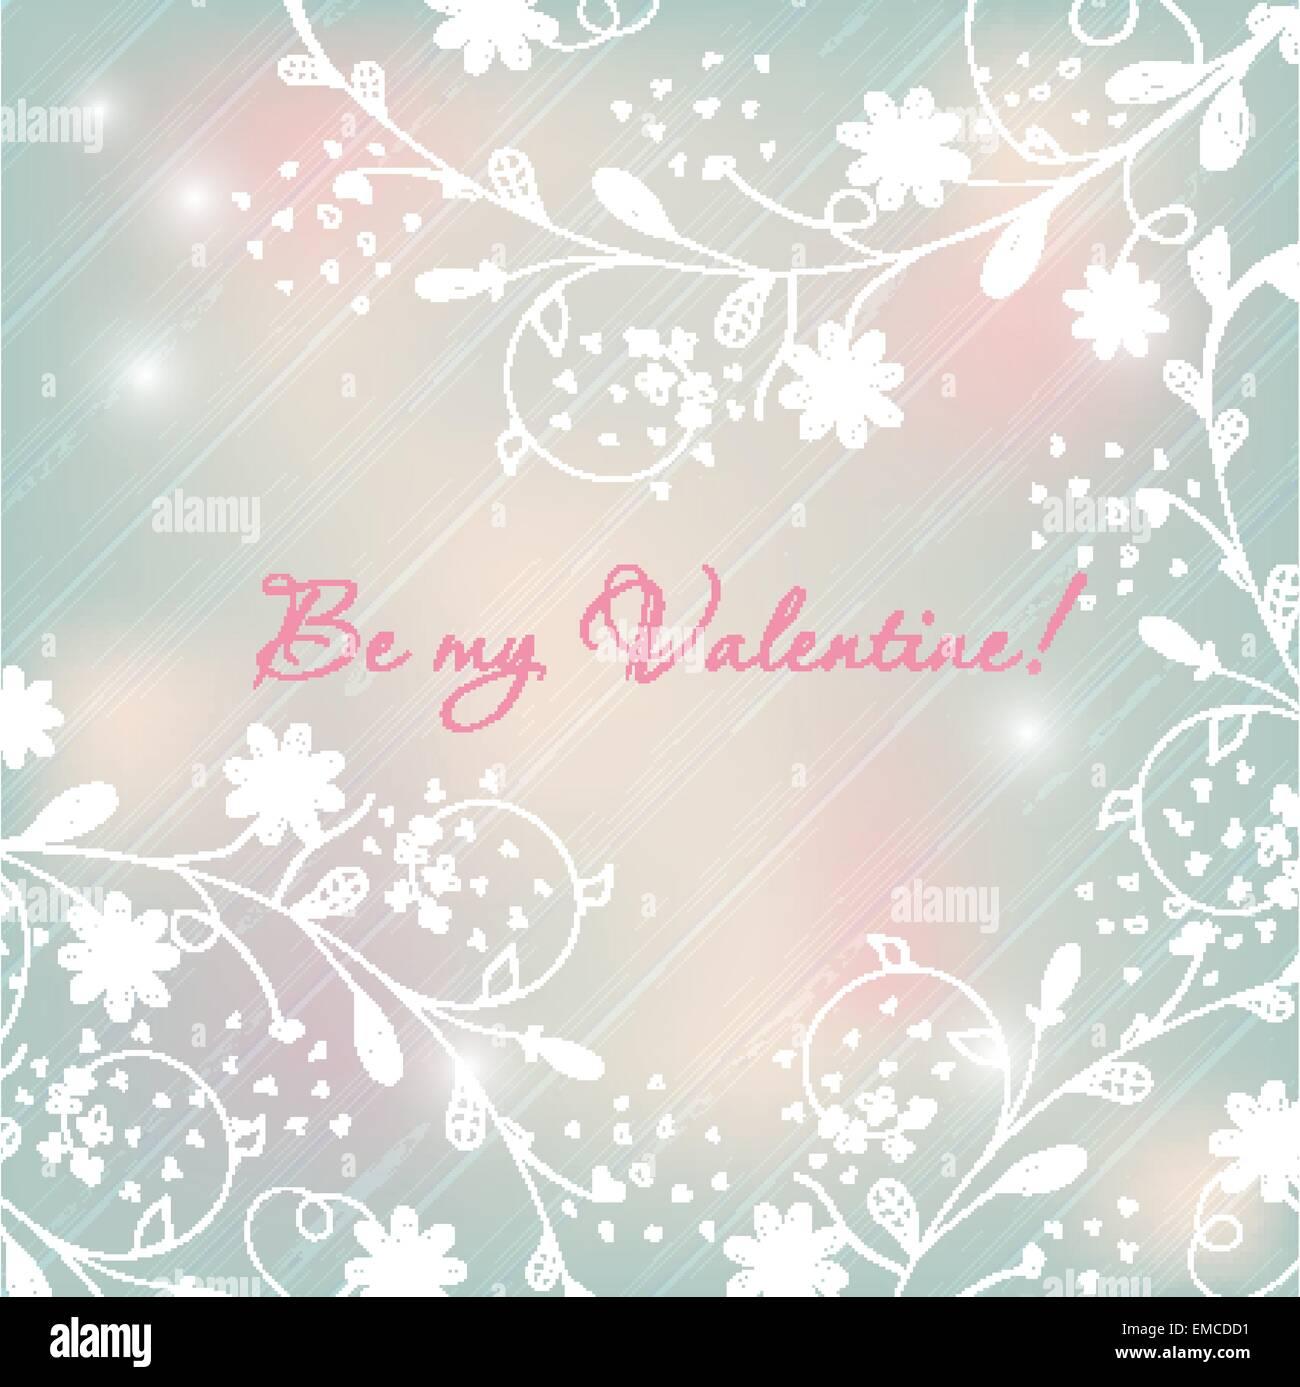 Light Pastel Floral Background Valentines Design Stock Vector Art